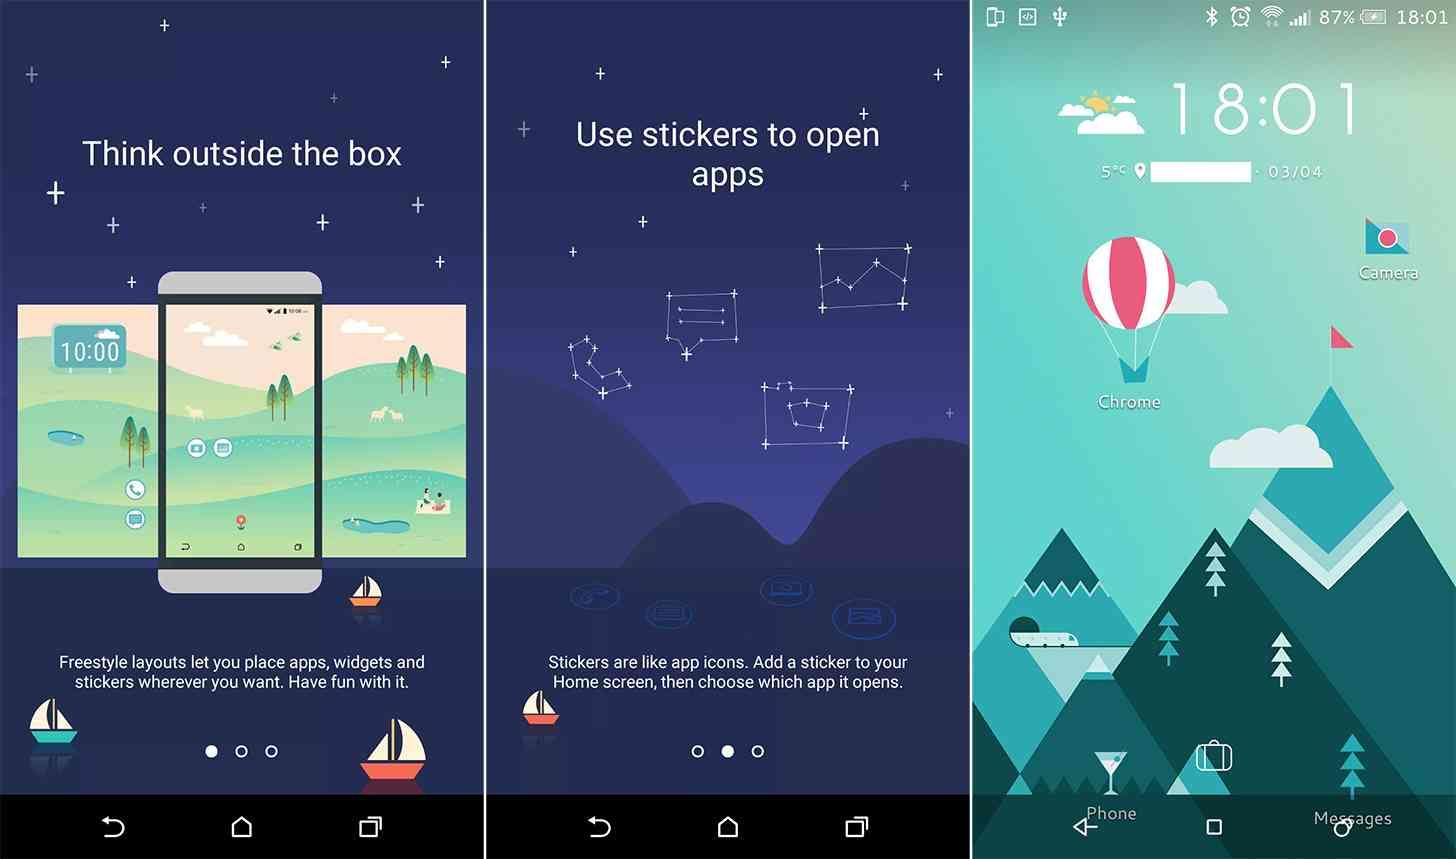 HTC Sense - Android Community